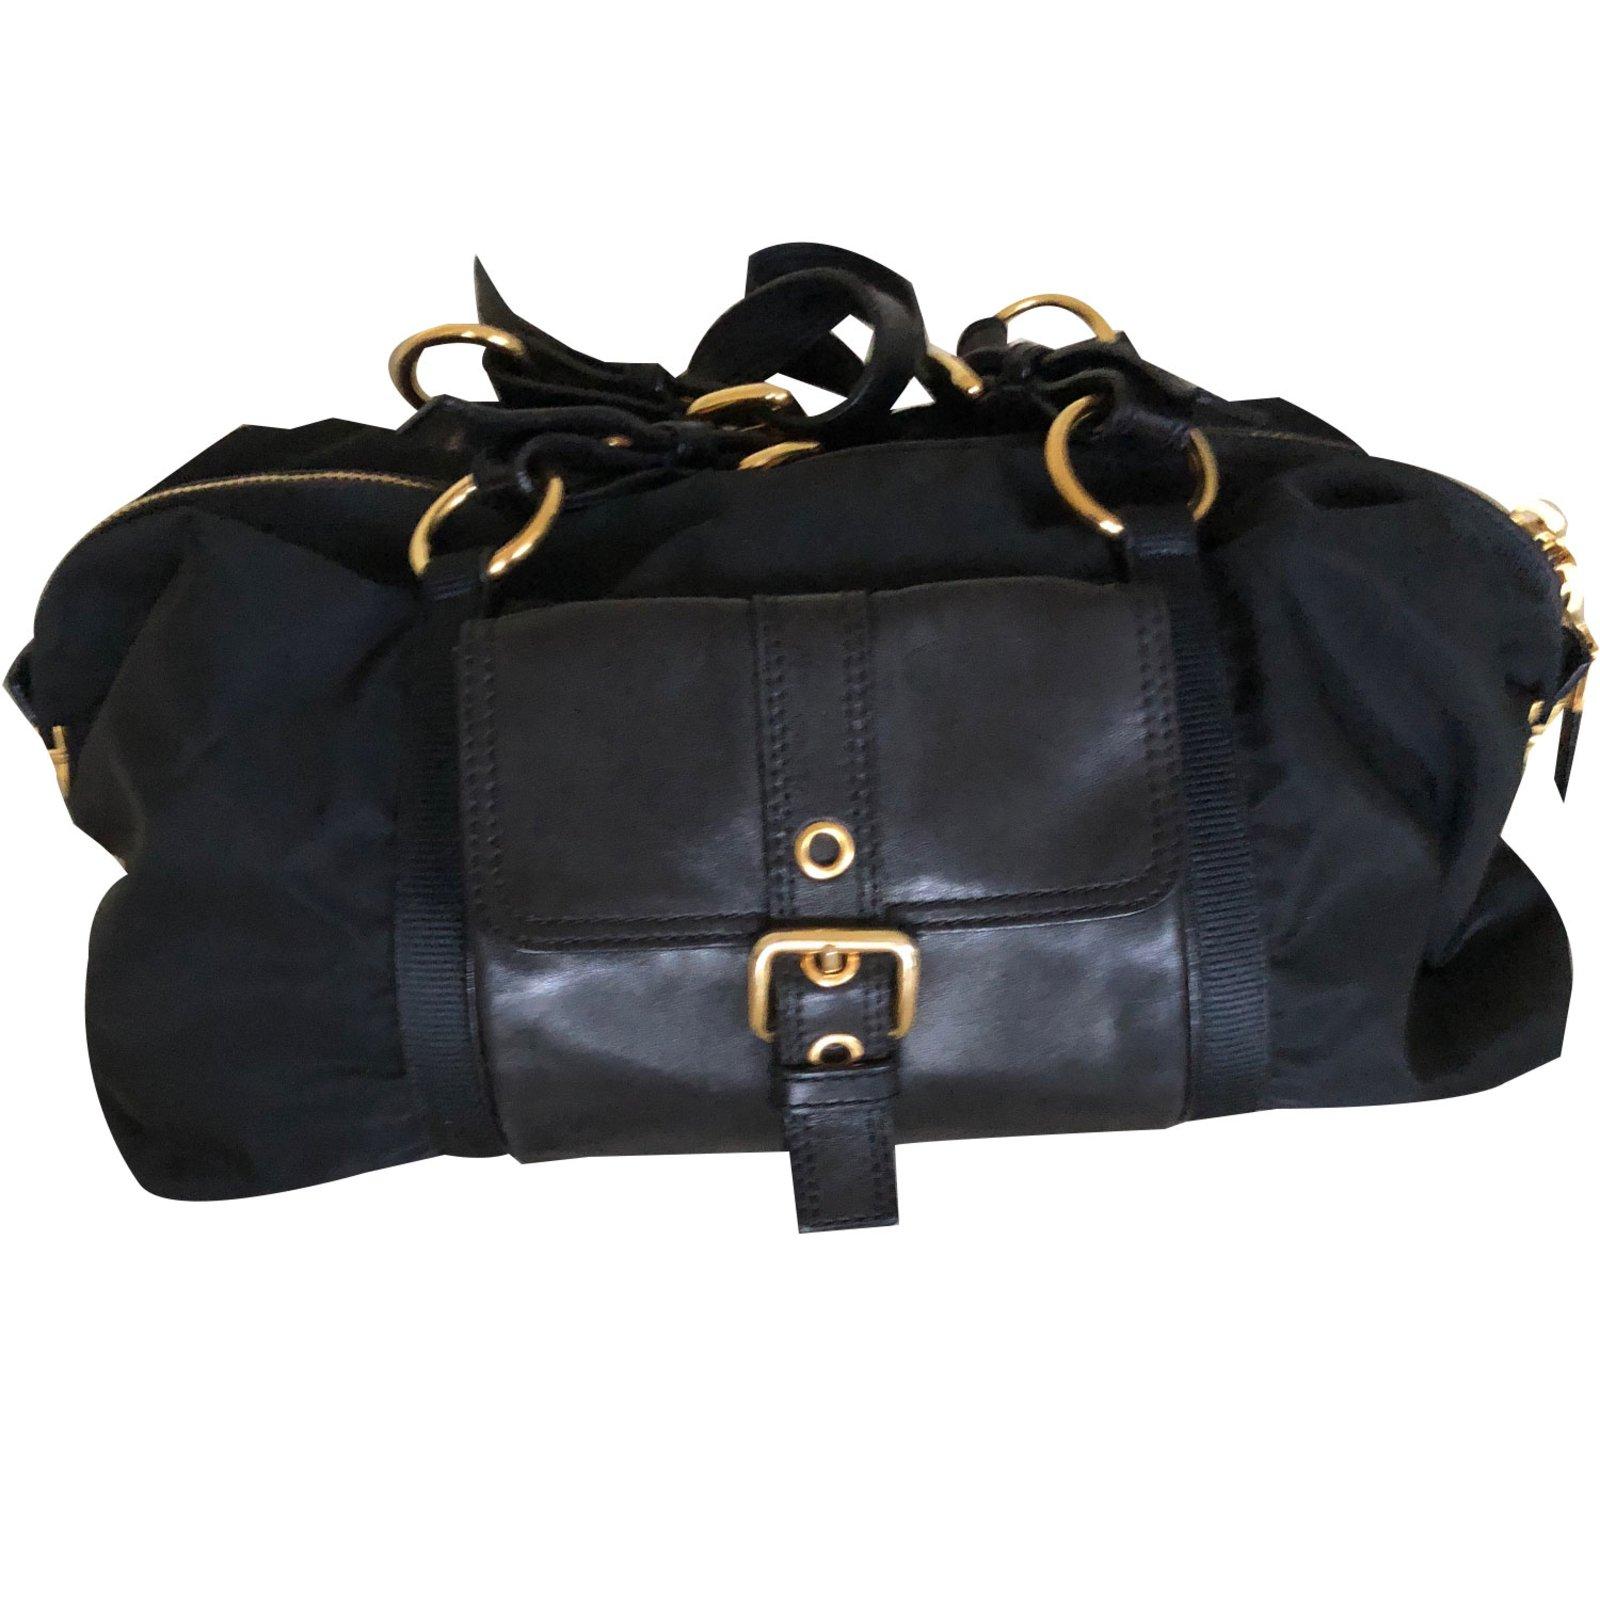 020aec5db5c7ff ... handbag black 0327d fab20; inexpensive prada handbags handbags nylon  blackother ref.64193 709b4 d71fe